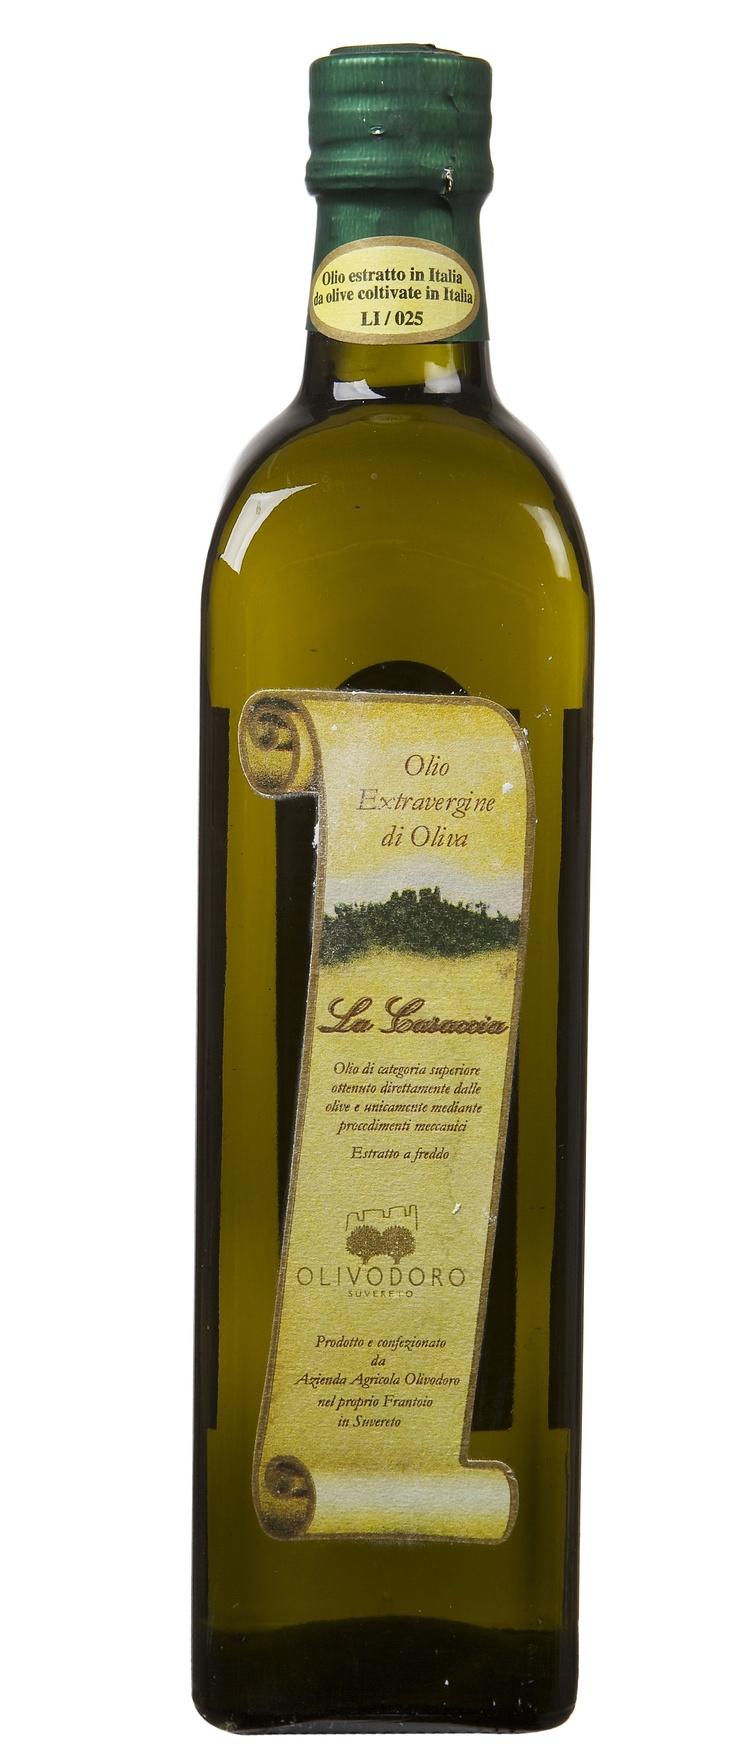 Olio extra vergine d'oliva toscano La Casaccia - Extra virgin olive oil La Casaccia. Olivodoro.